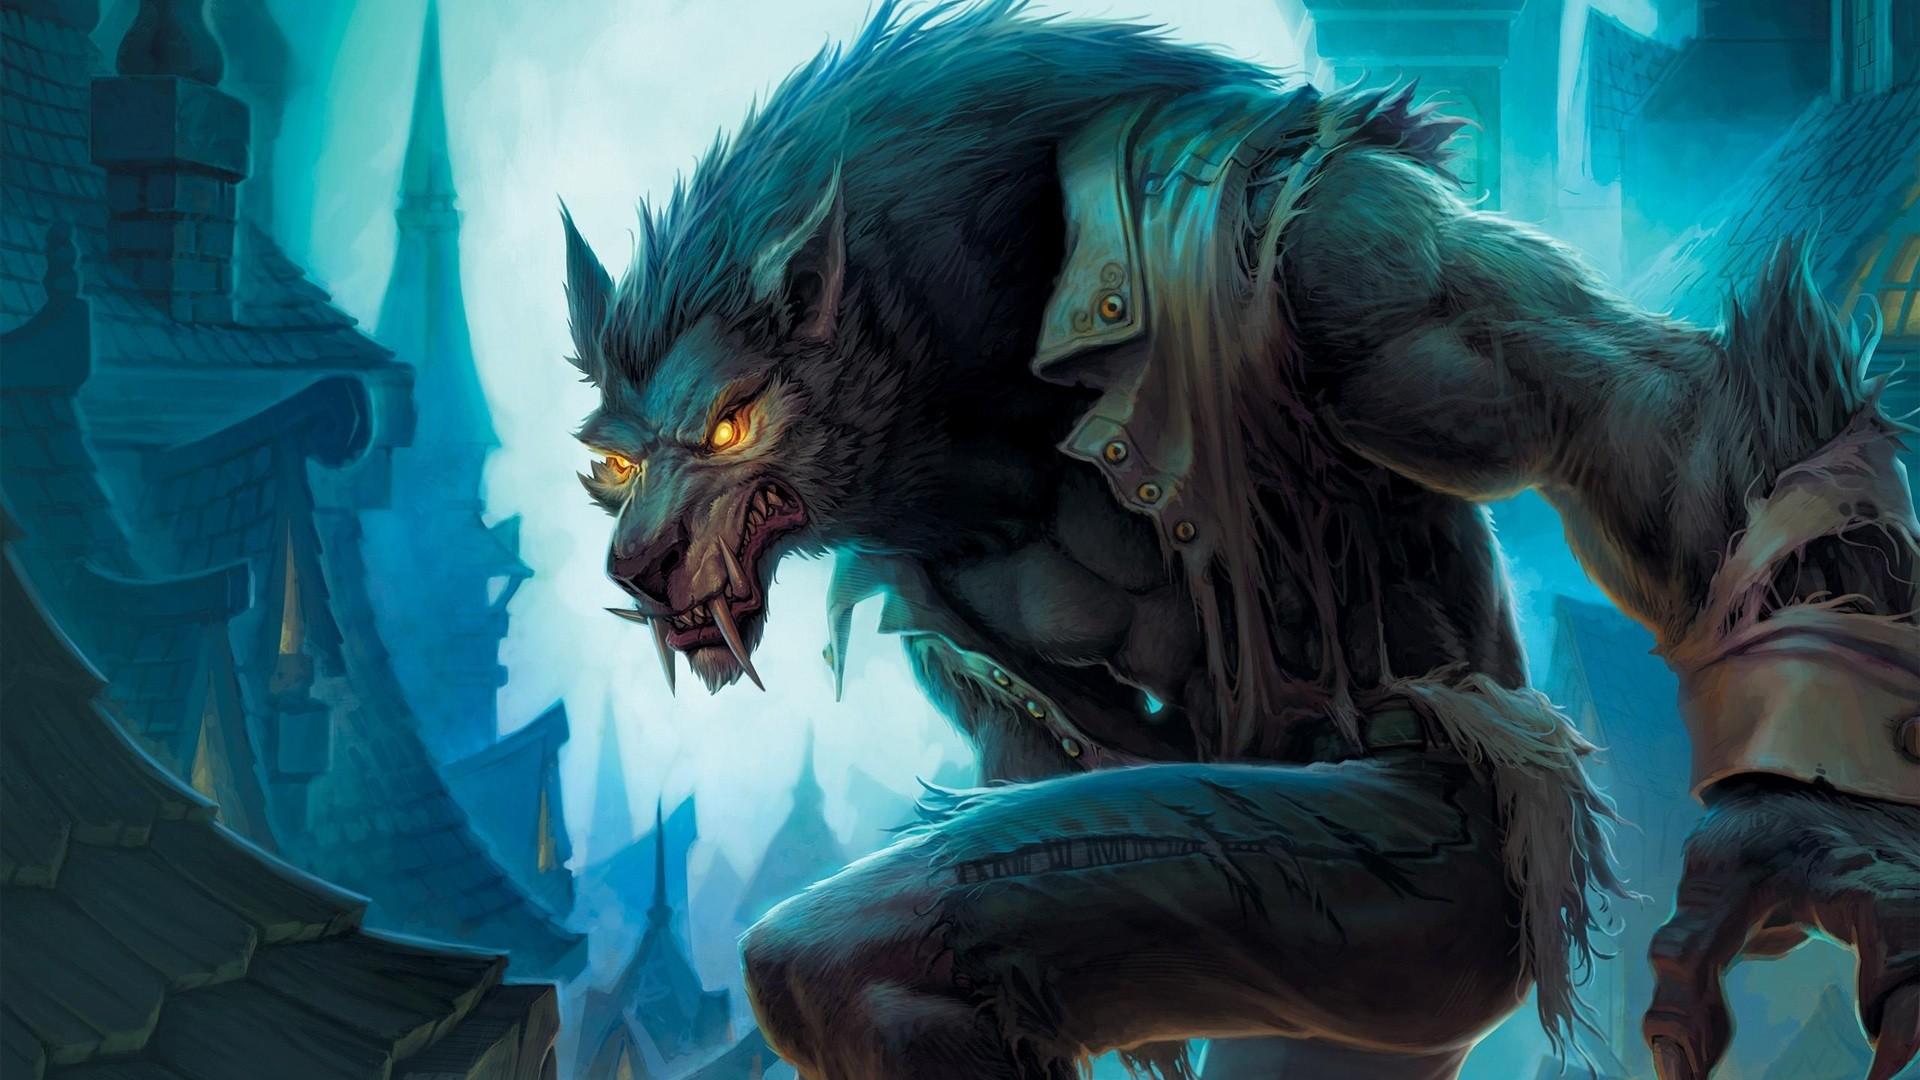 World Of Warcraft HD Wallpaper ID: 1920×1080 World Of Warcraft HD Wallpapers  |